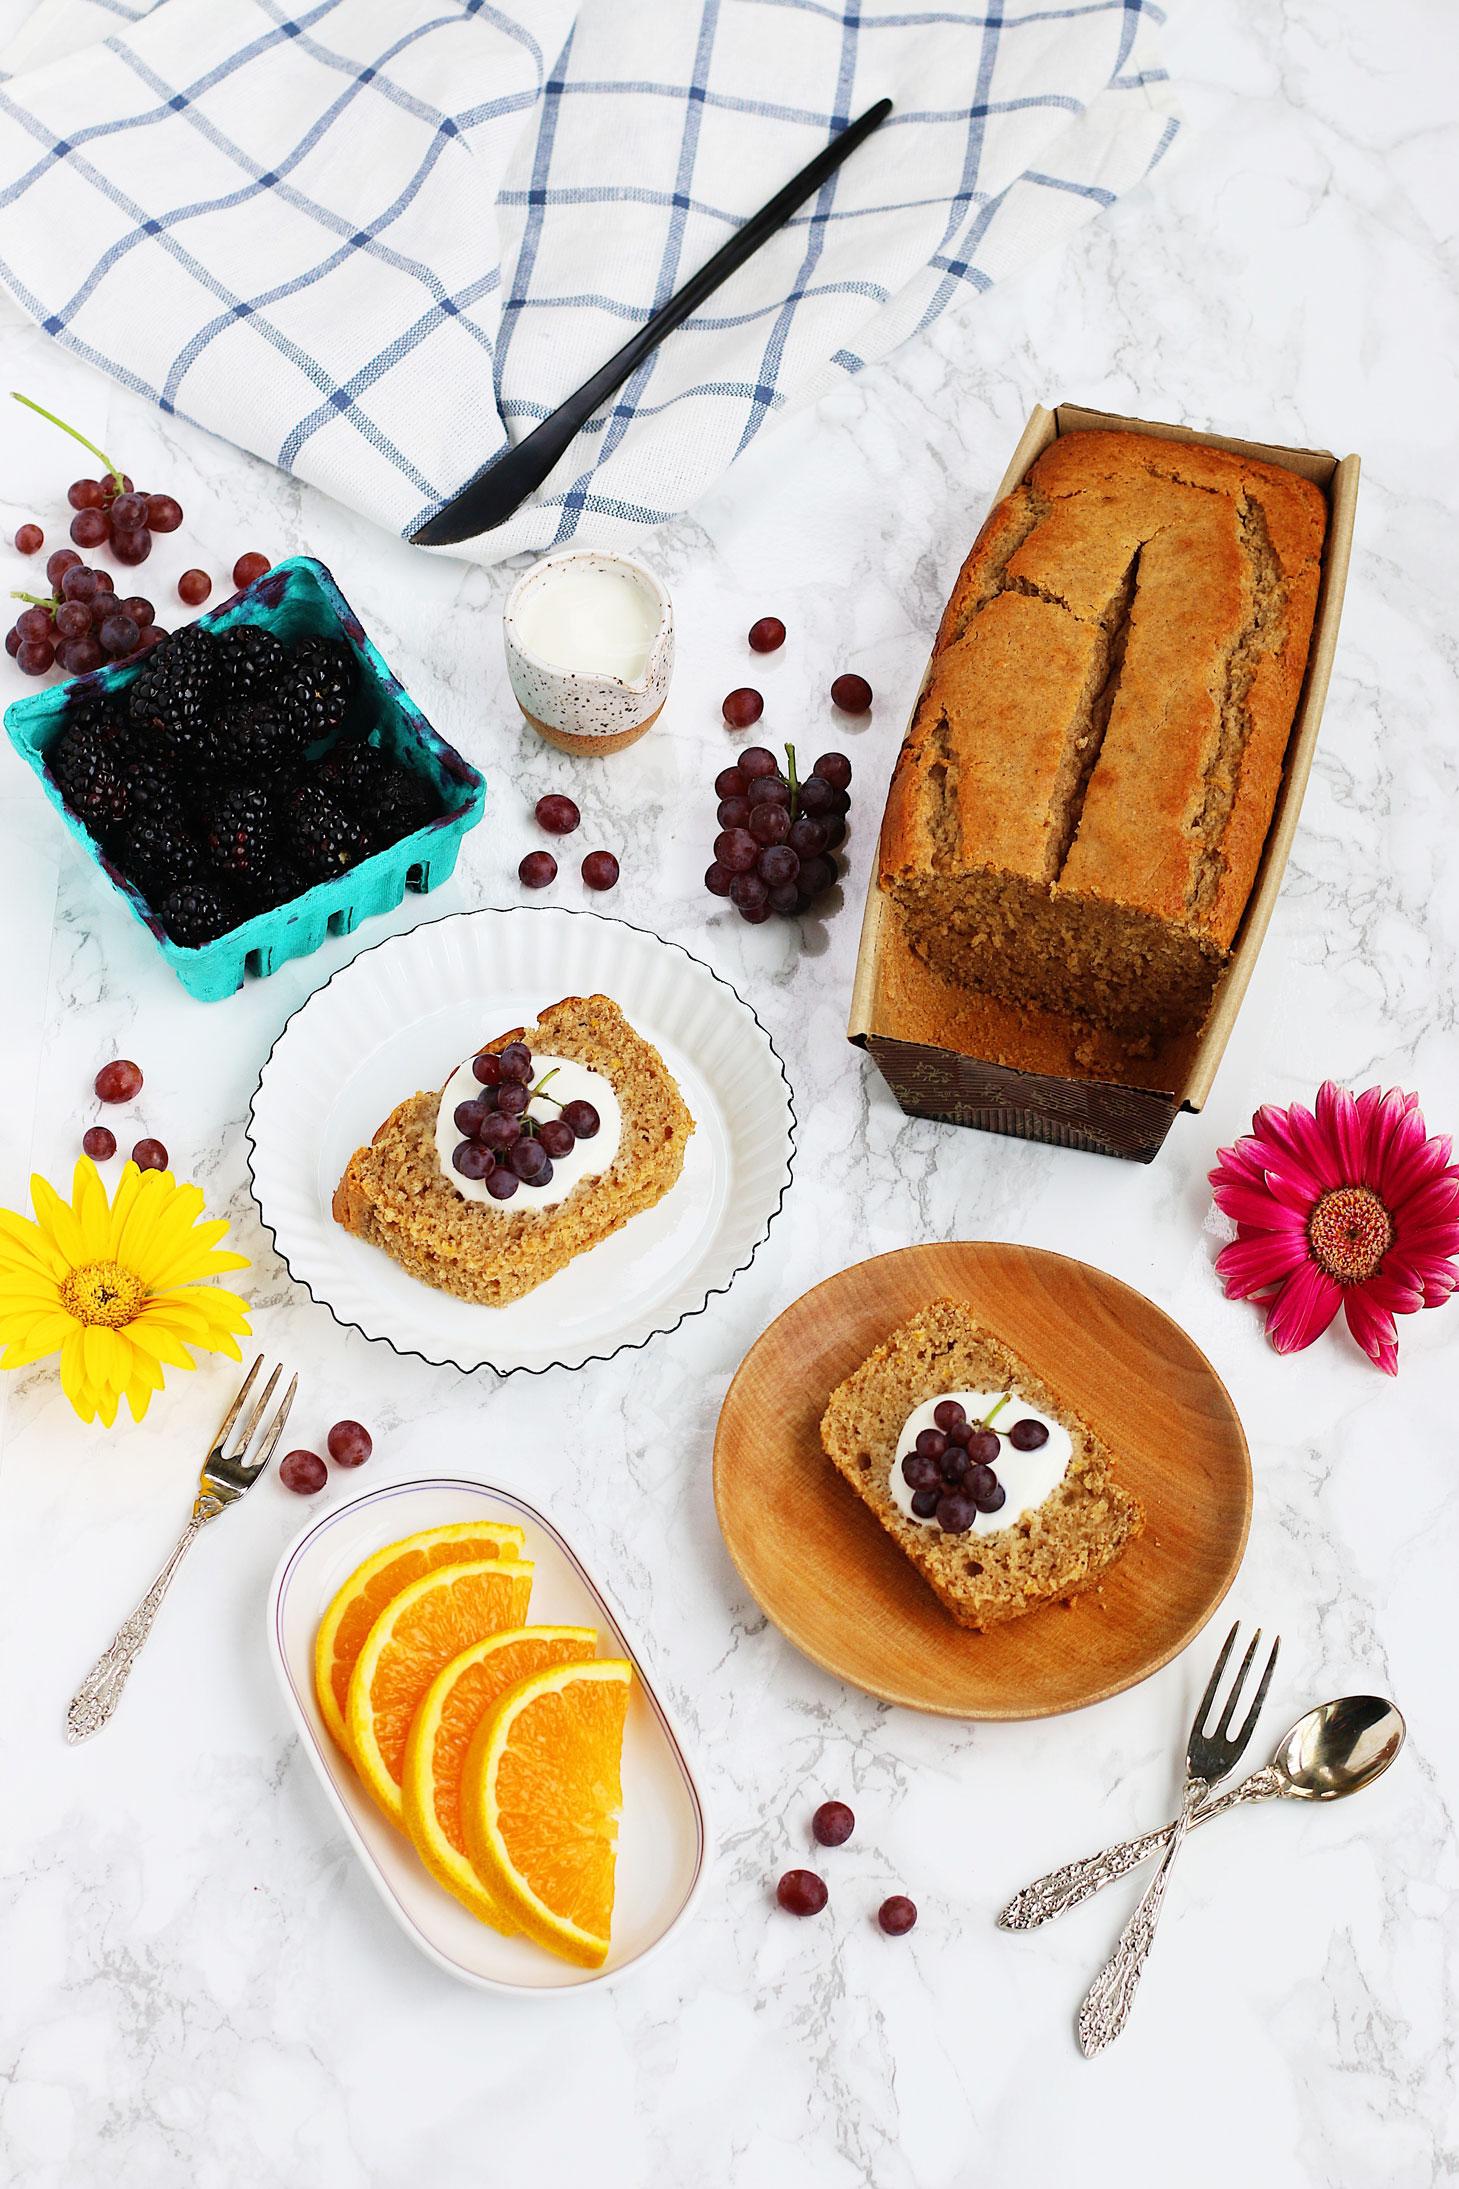 herbakinglab-orange-cardamom-yogurt-loaf-cake-picnic